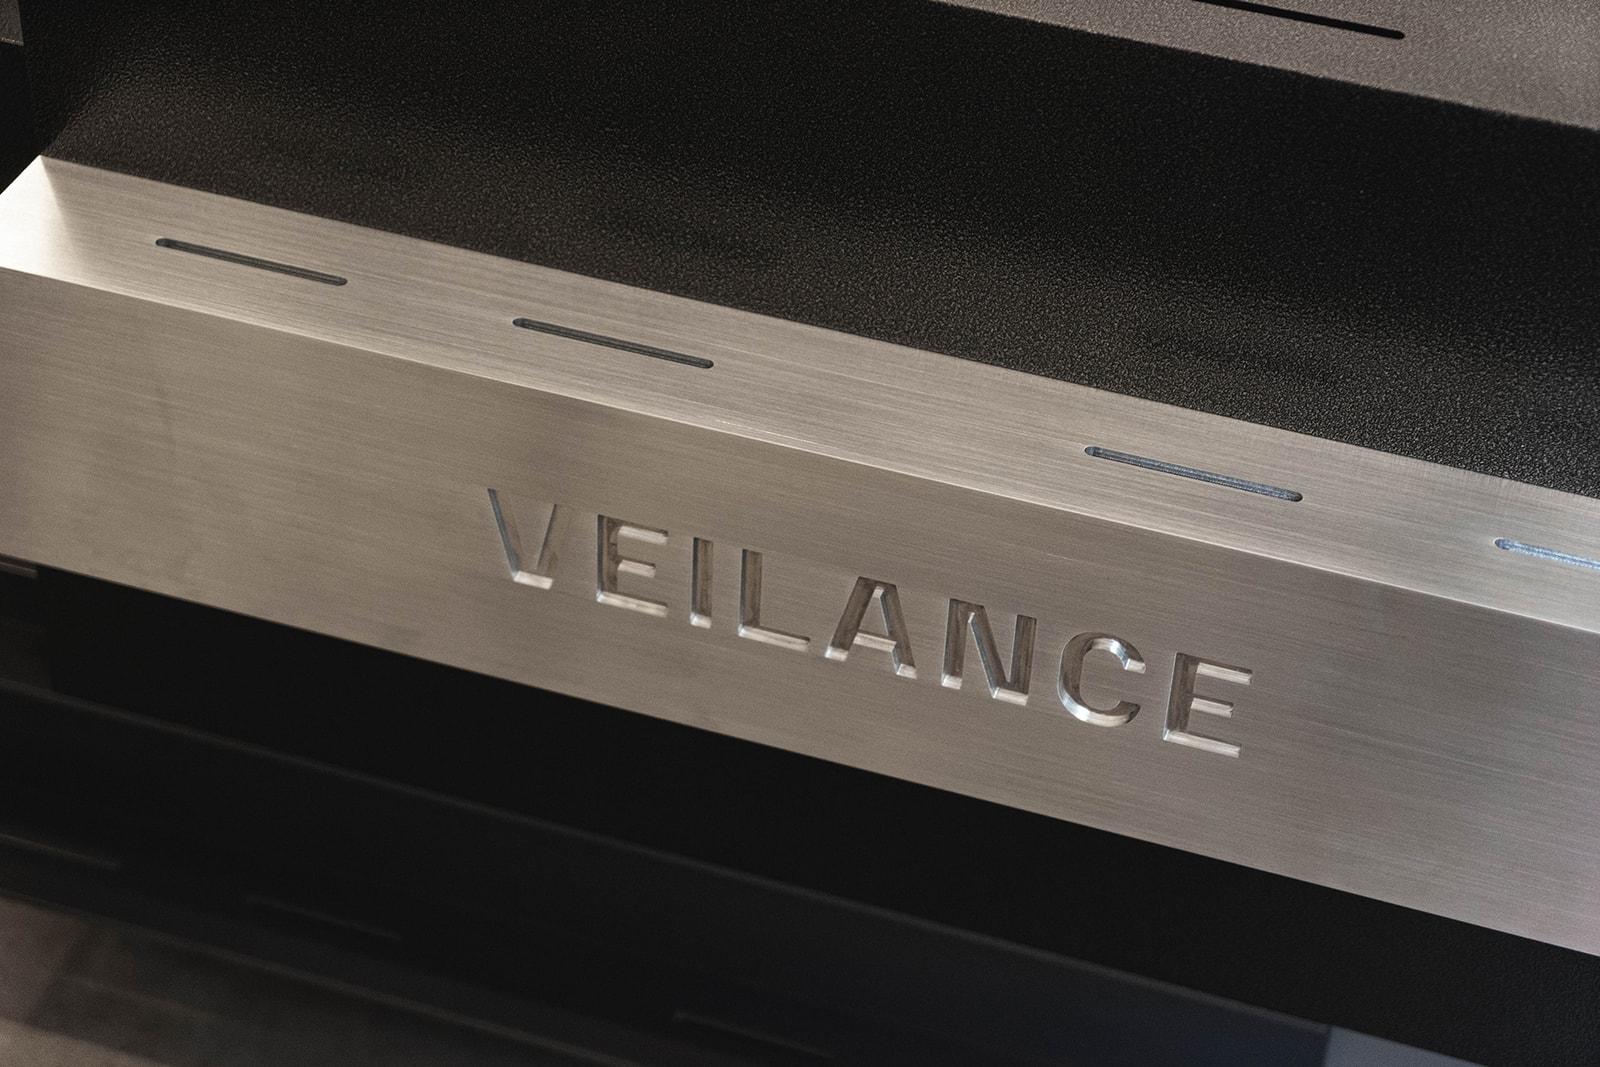 Arc'teryx Veilance 正式落戶香港!HYPEBEAST 專訪品牌創意總監 Taka Kasuga